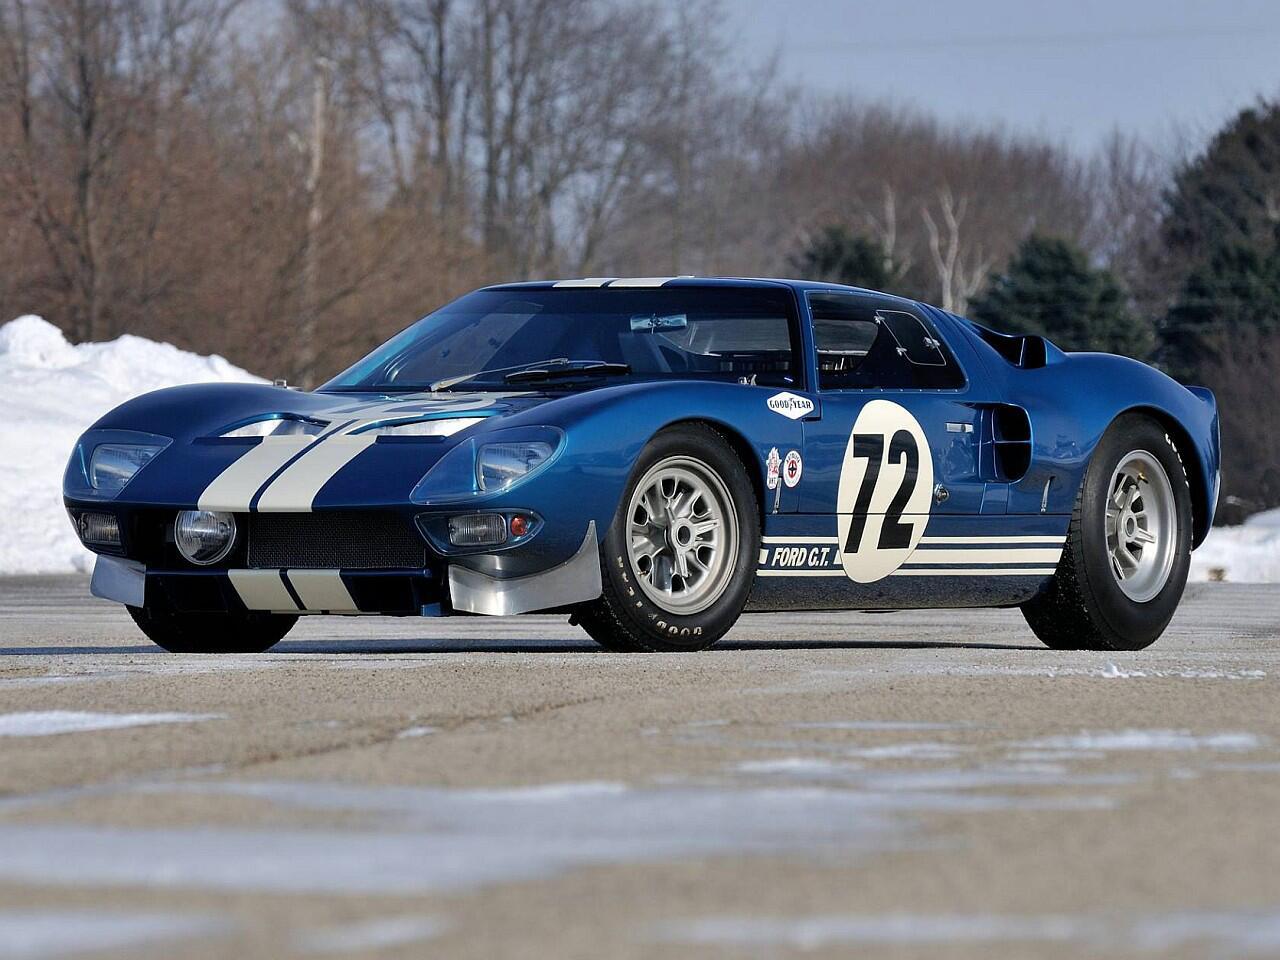 Bild zu Platz 10: Ford GT 40 Prototyp